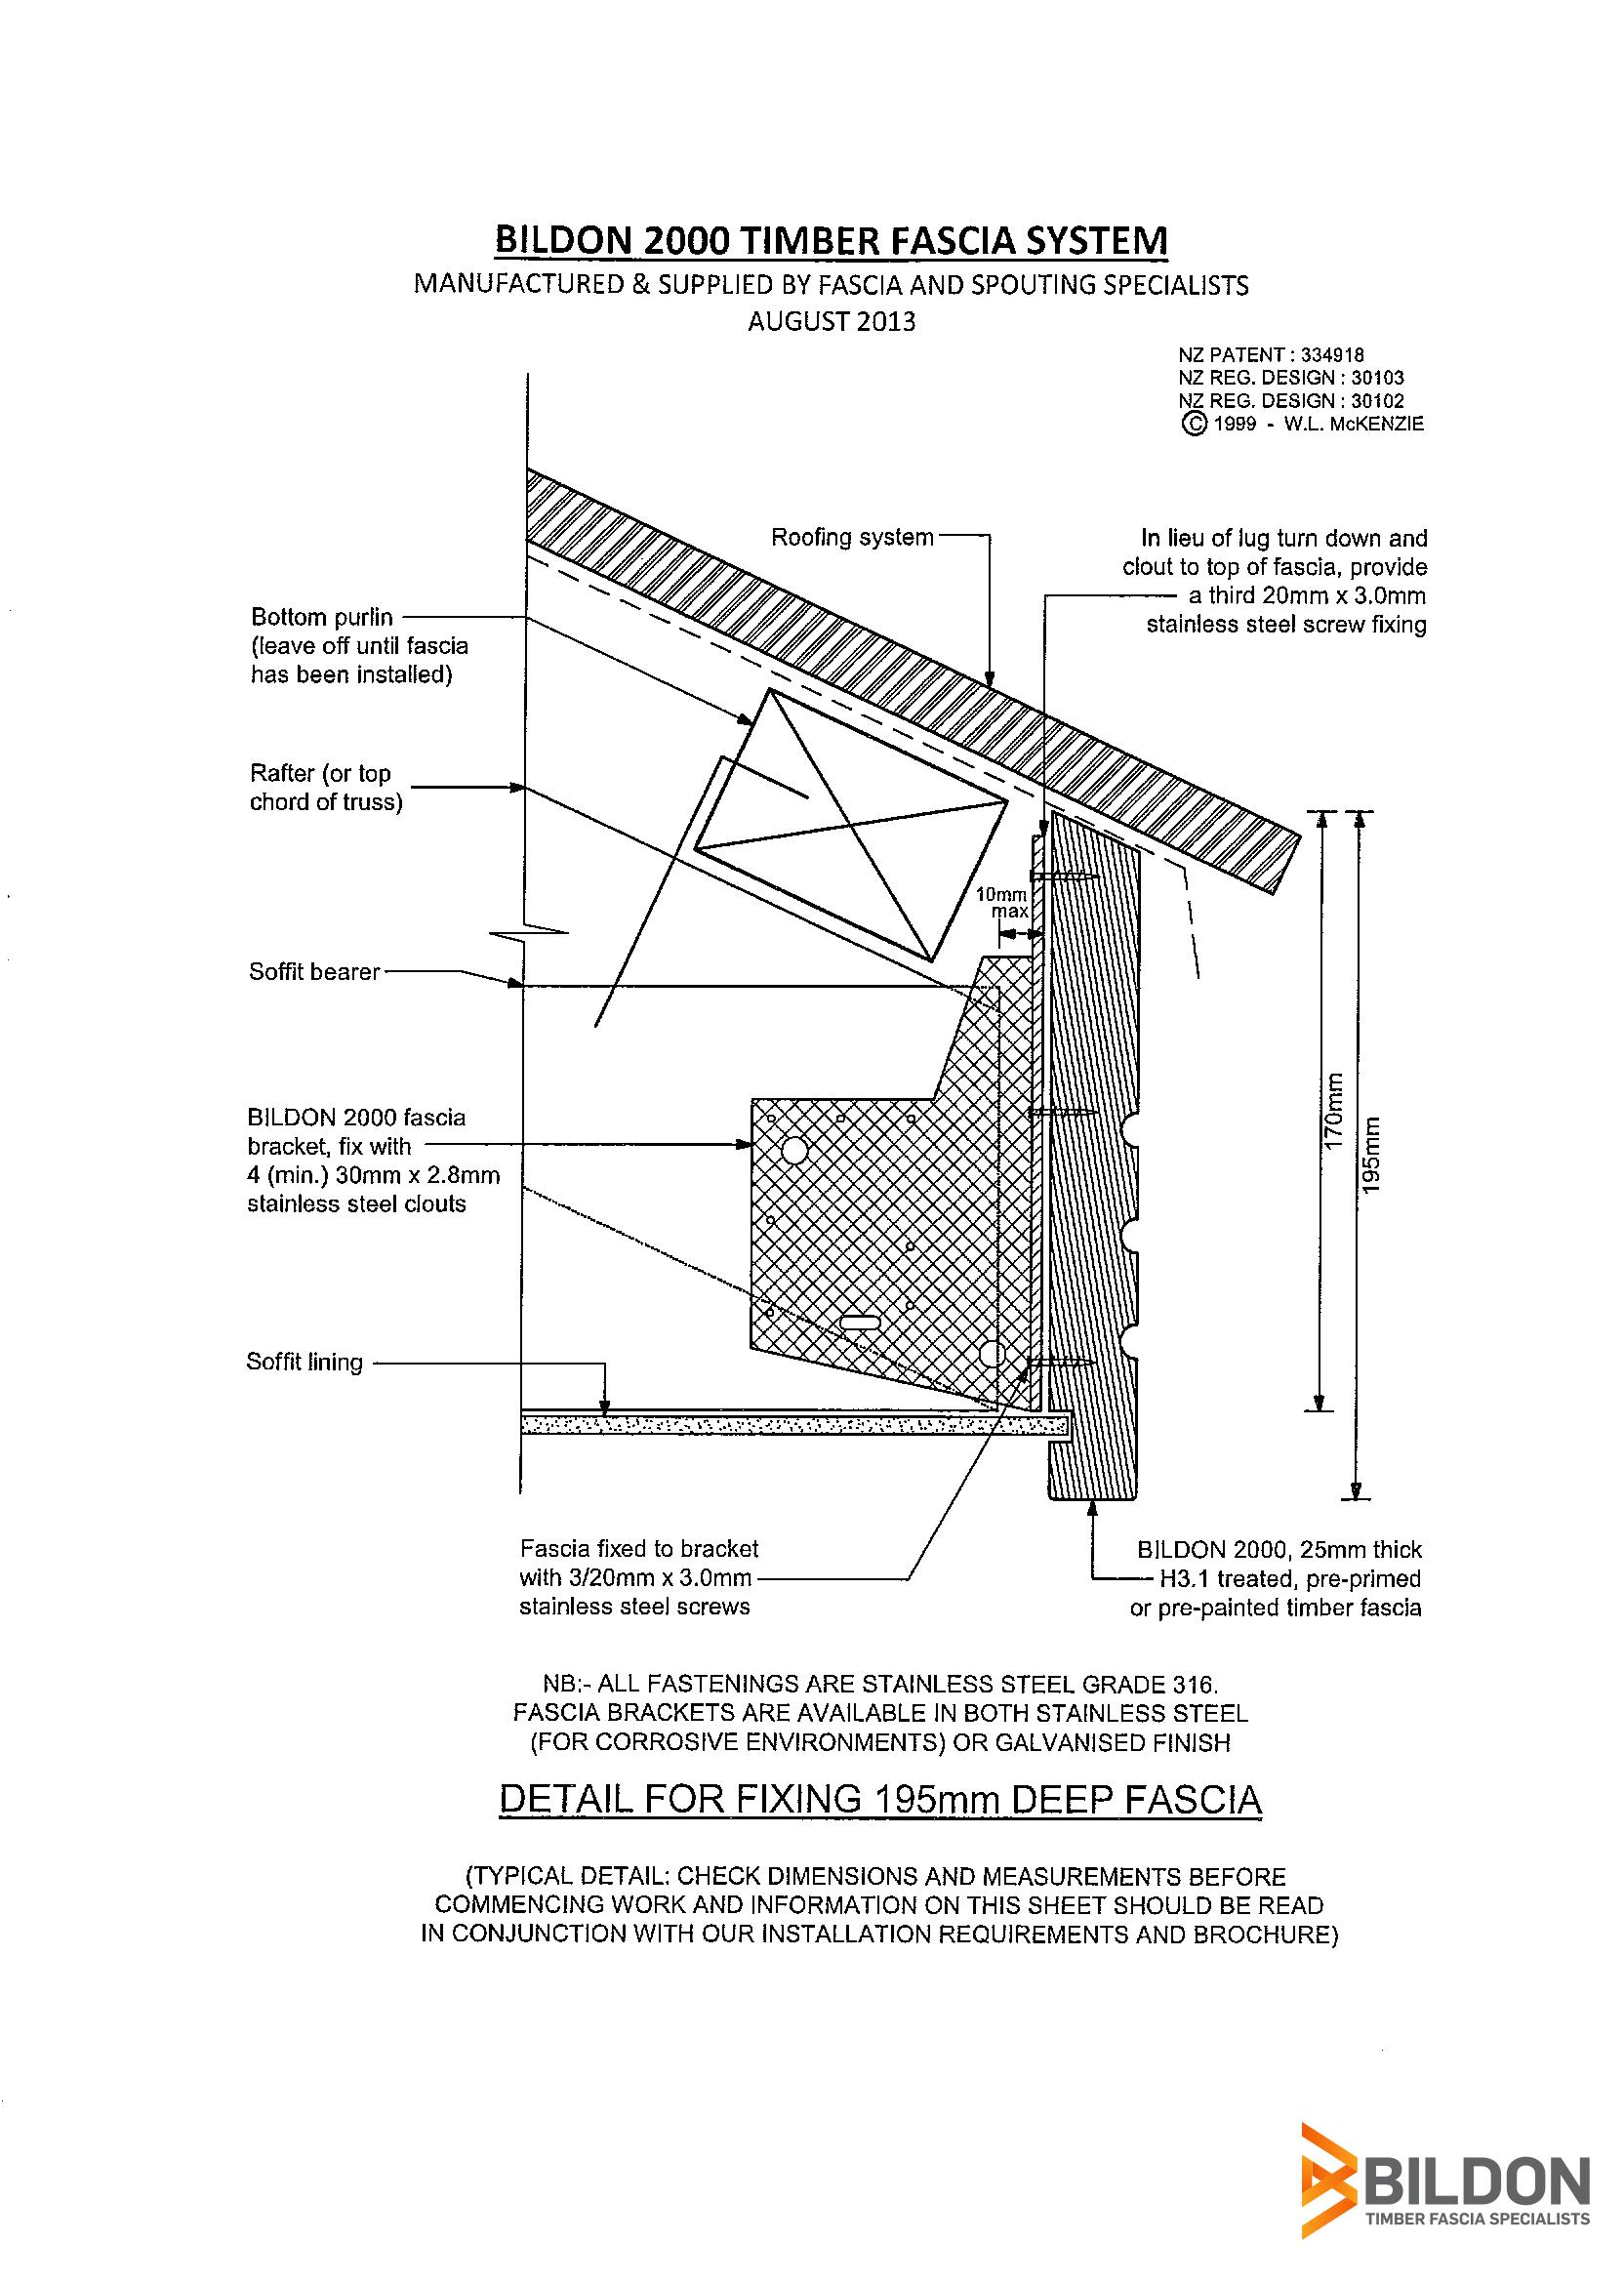 Detail for Fixing 195mm Deep Fascia.jpg